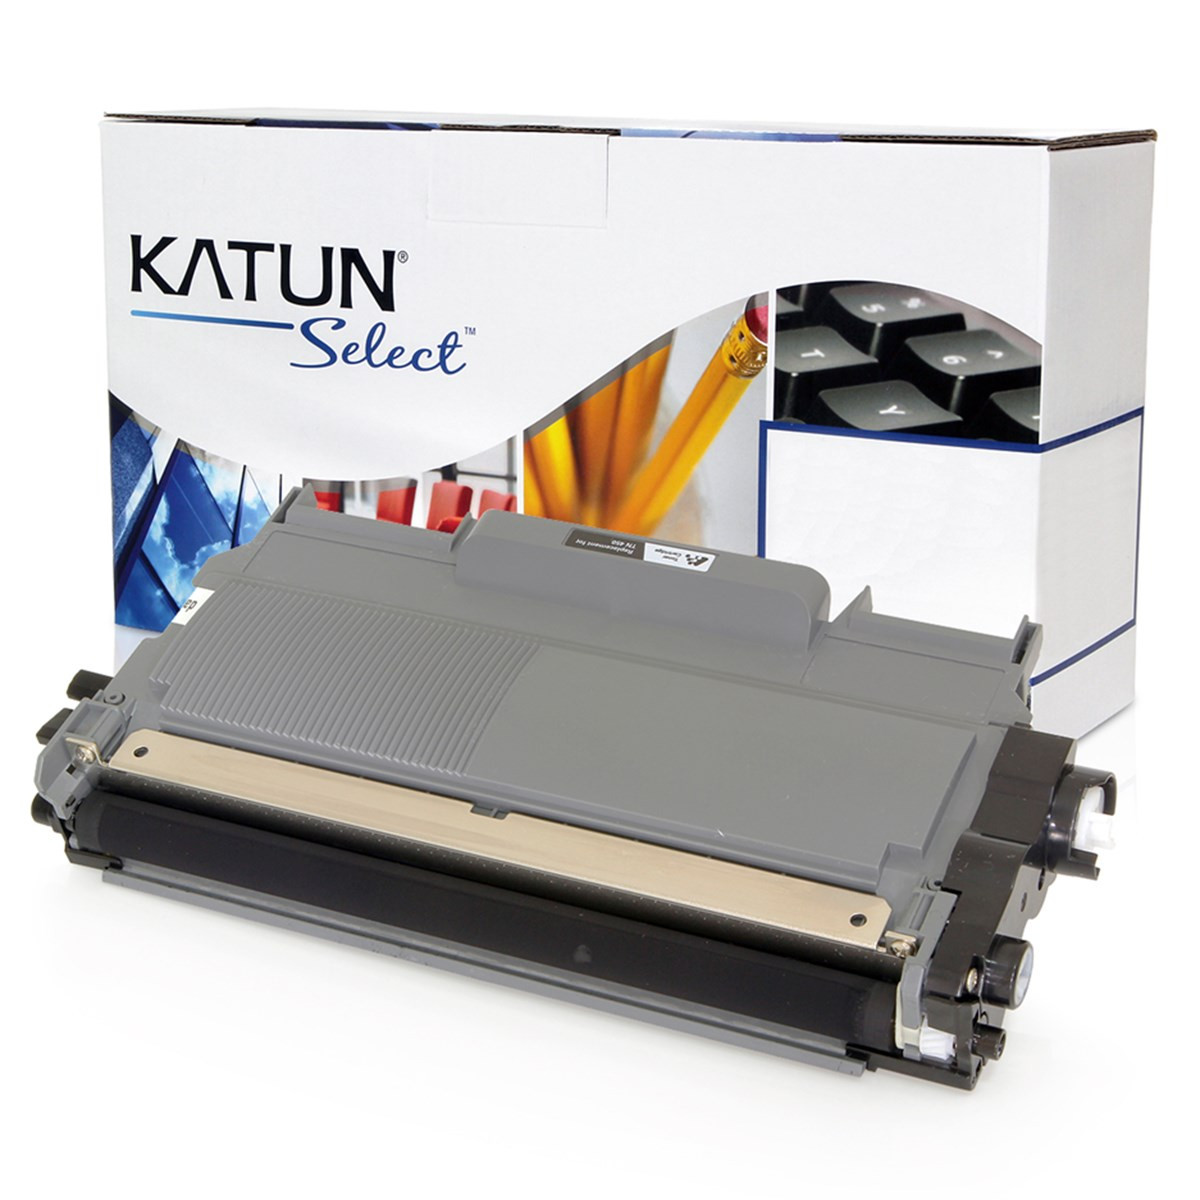 Toner Compatível com Brother TN450 | DCP-7060 HL-2220 MFC-7360 | Katun Select 2.6k